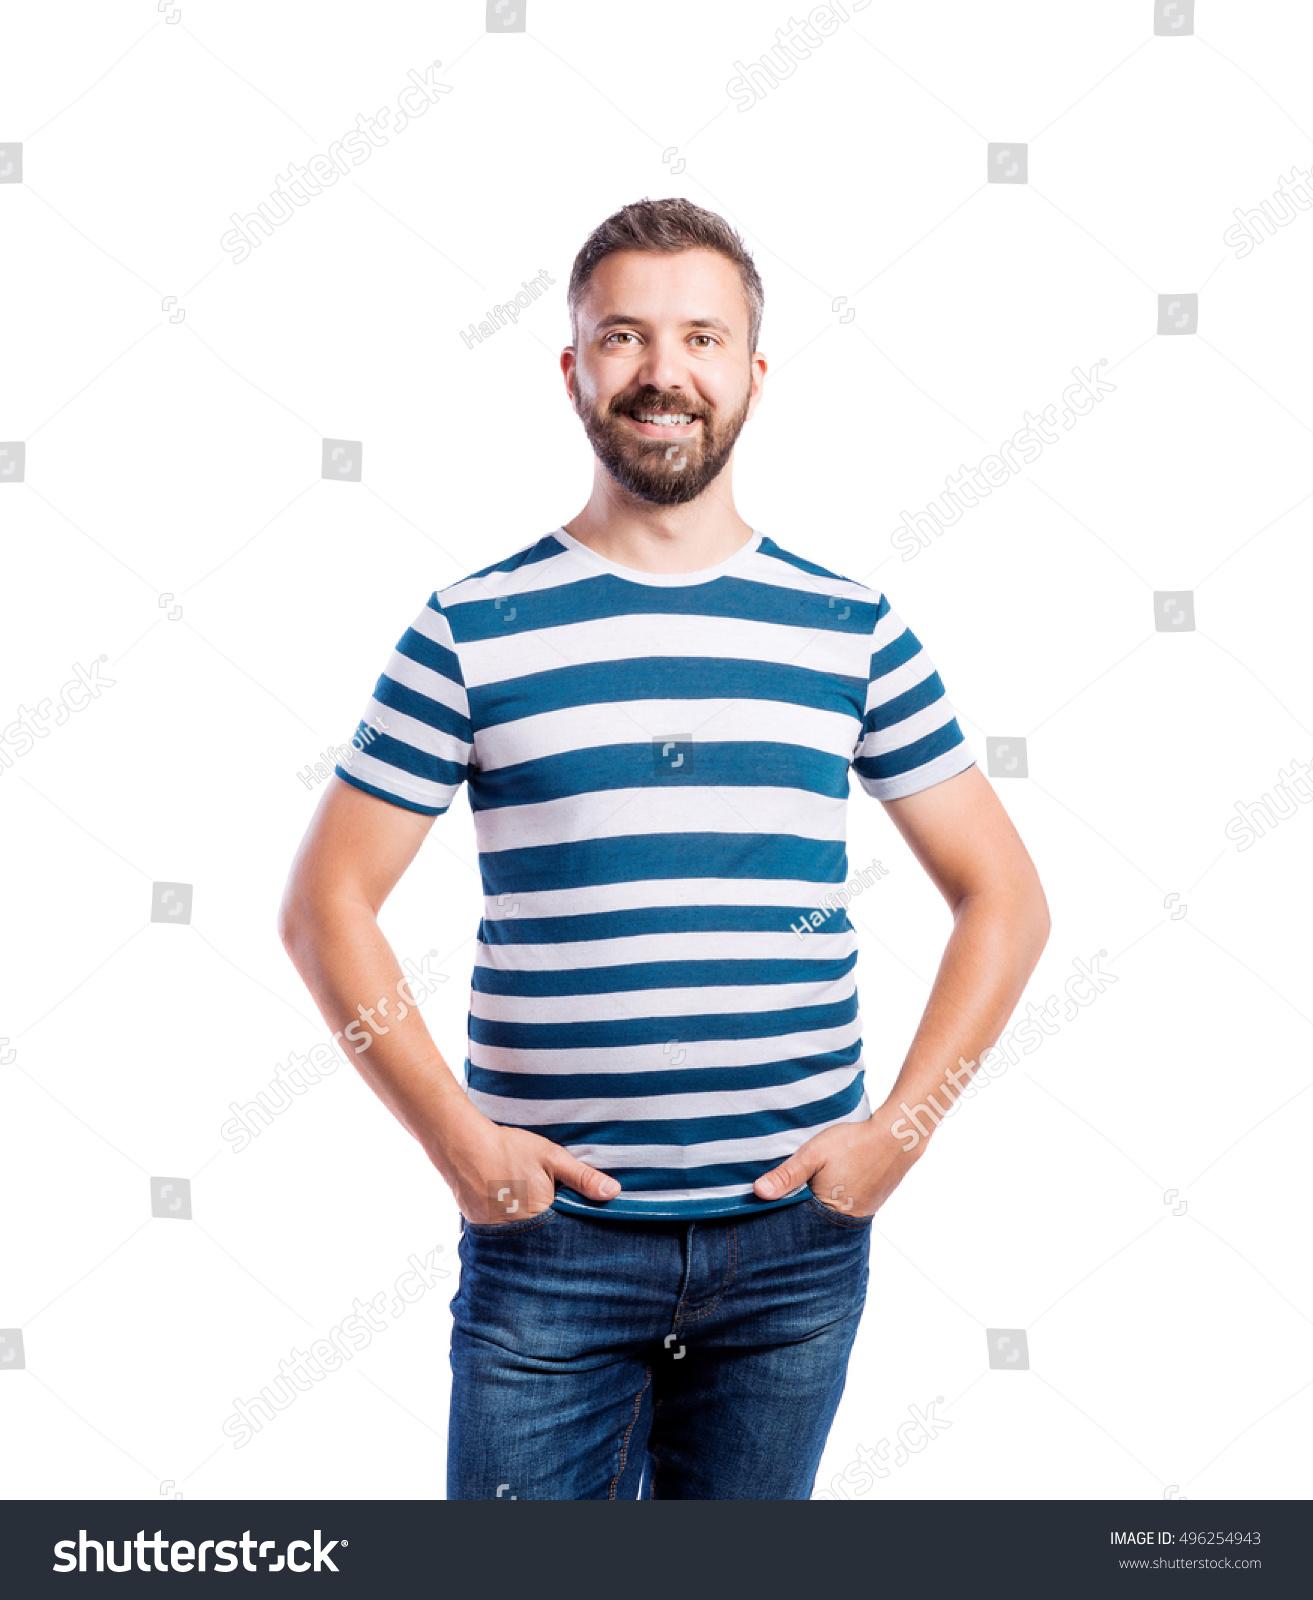 hipster man blue striped tshirt studio stock photo. Black Bedroom Furniture Sets. Home Design Ideas